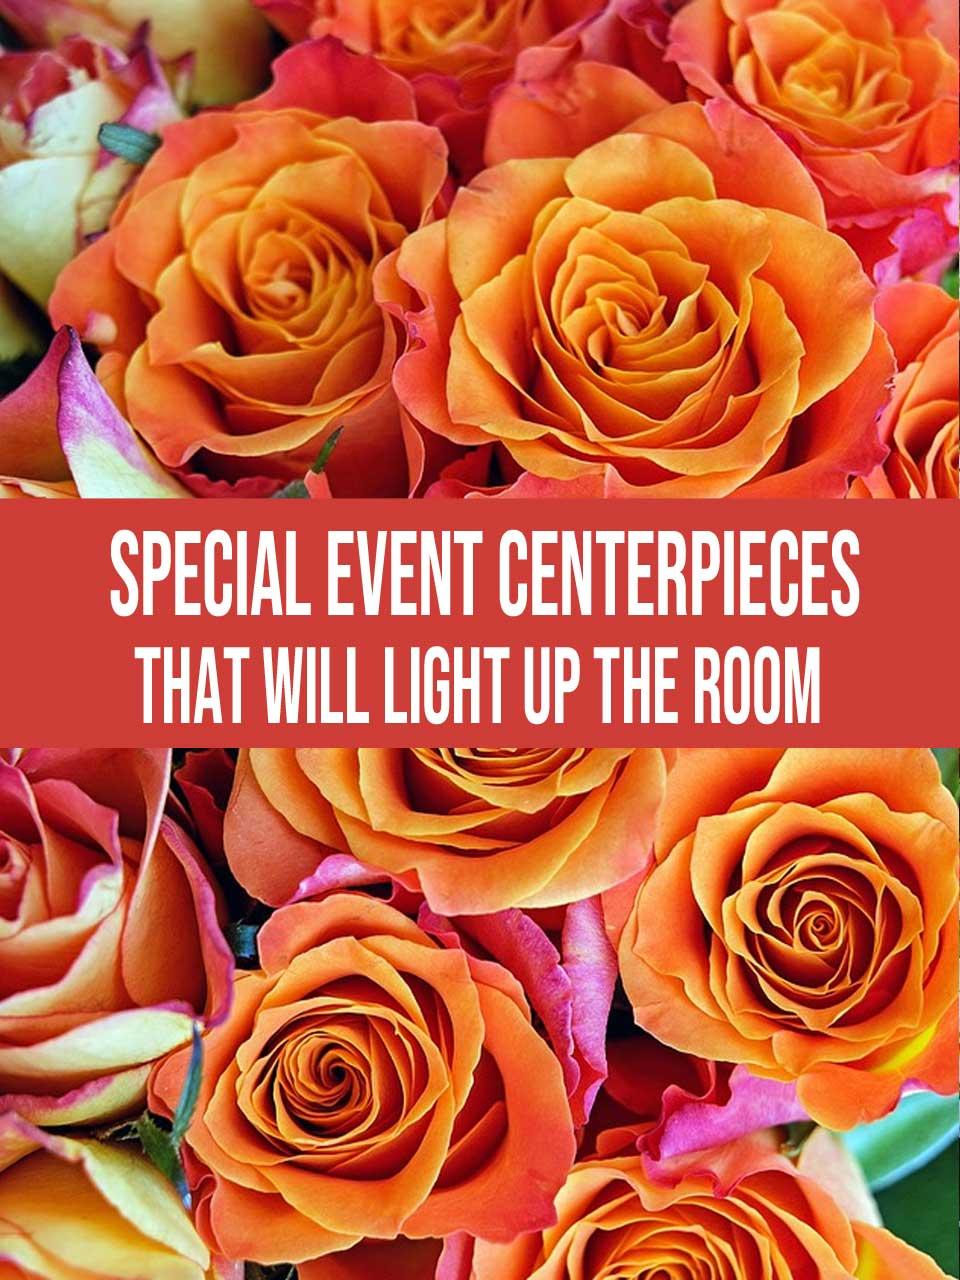 special event centerpieces